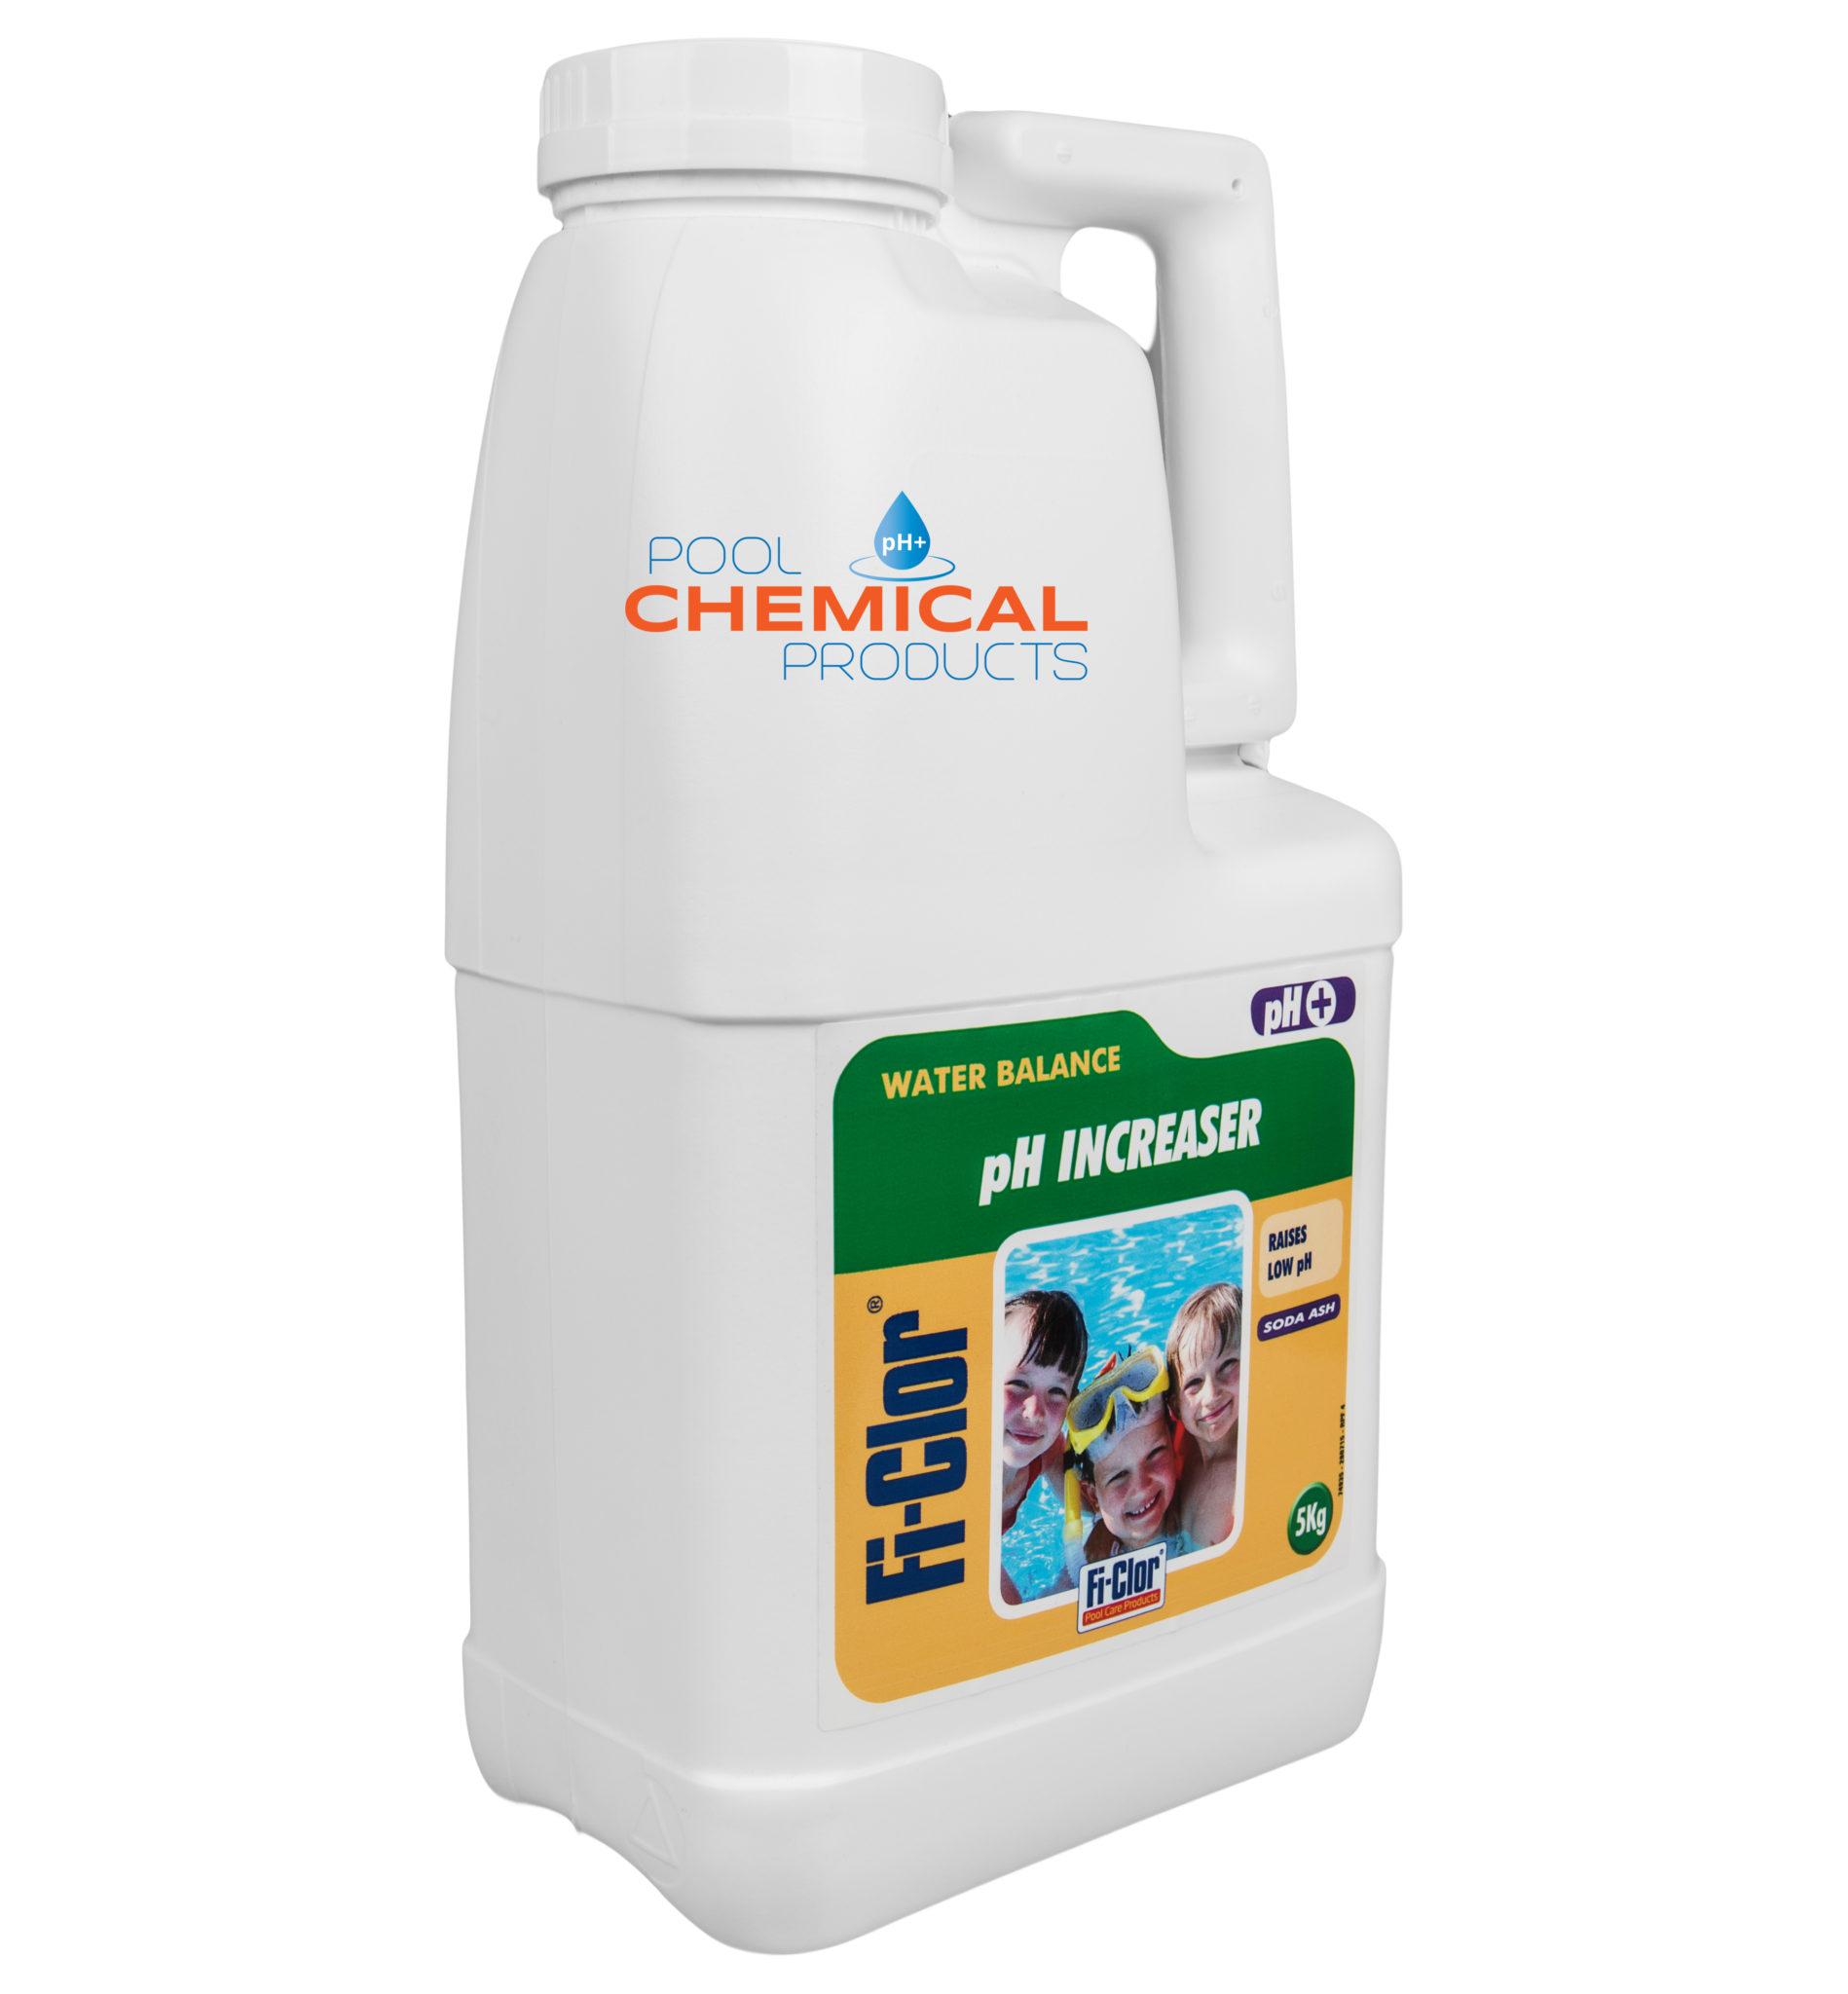 Fi Clor Ph Increaser 5kg 3521686150096 Ebay